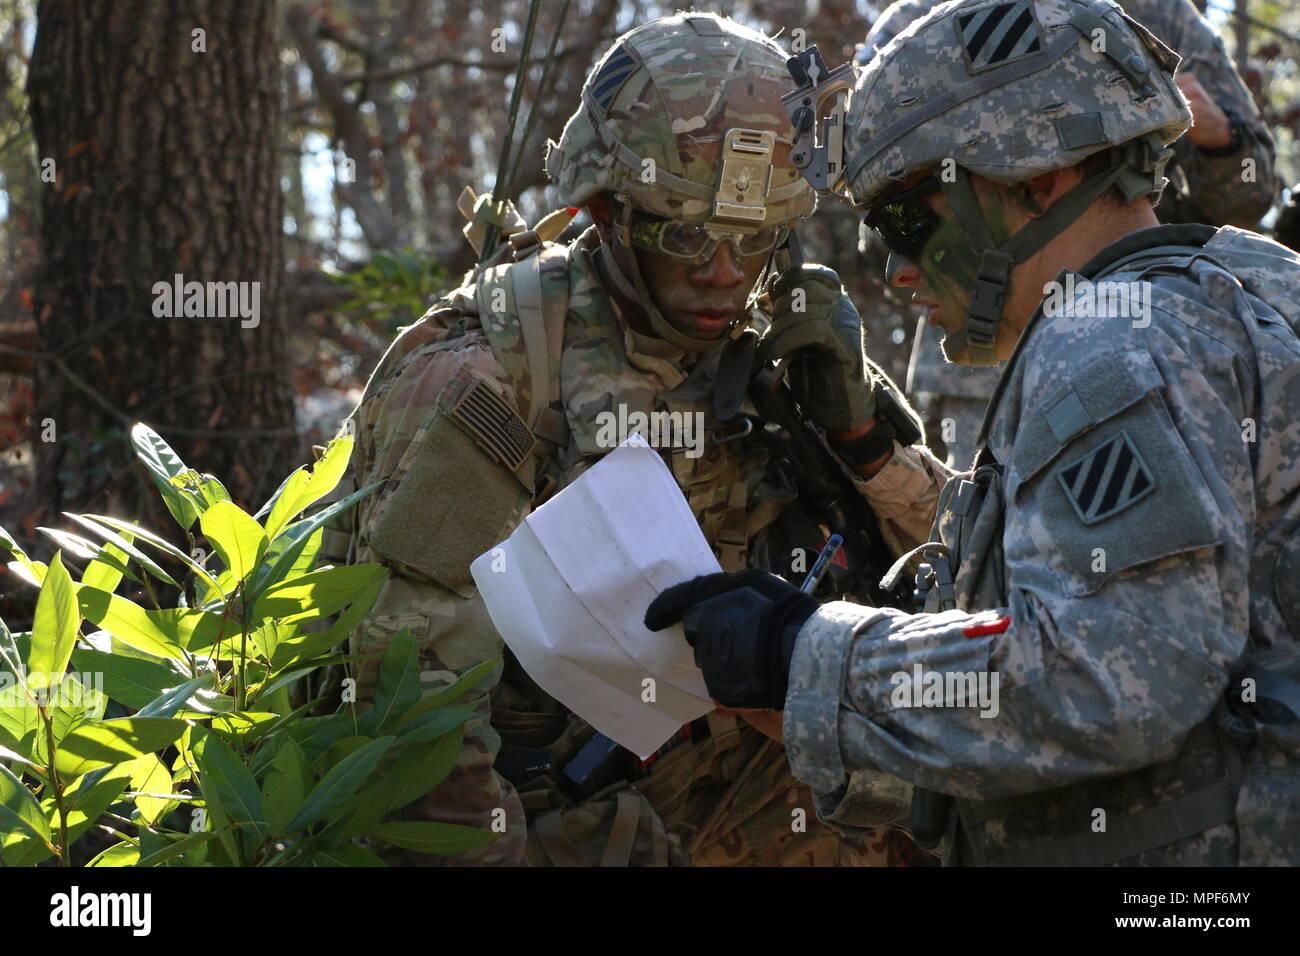 Us army field artillery fist